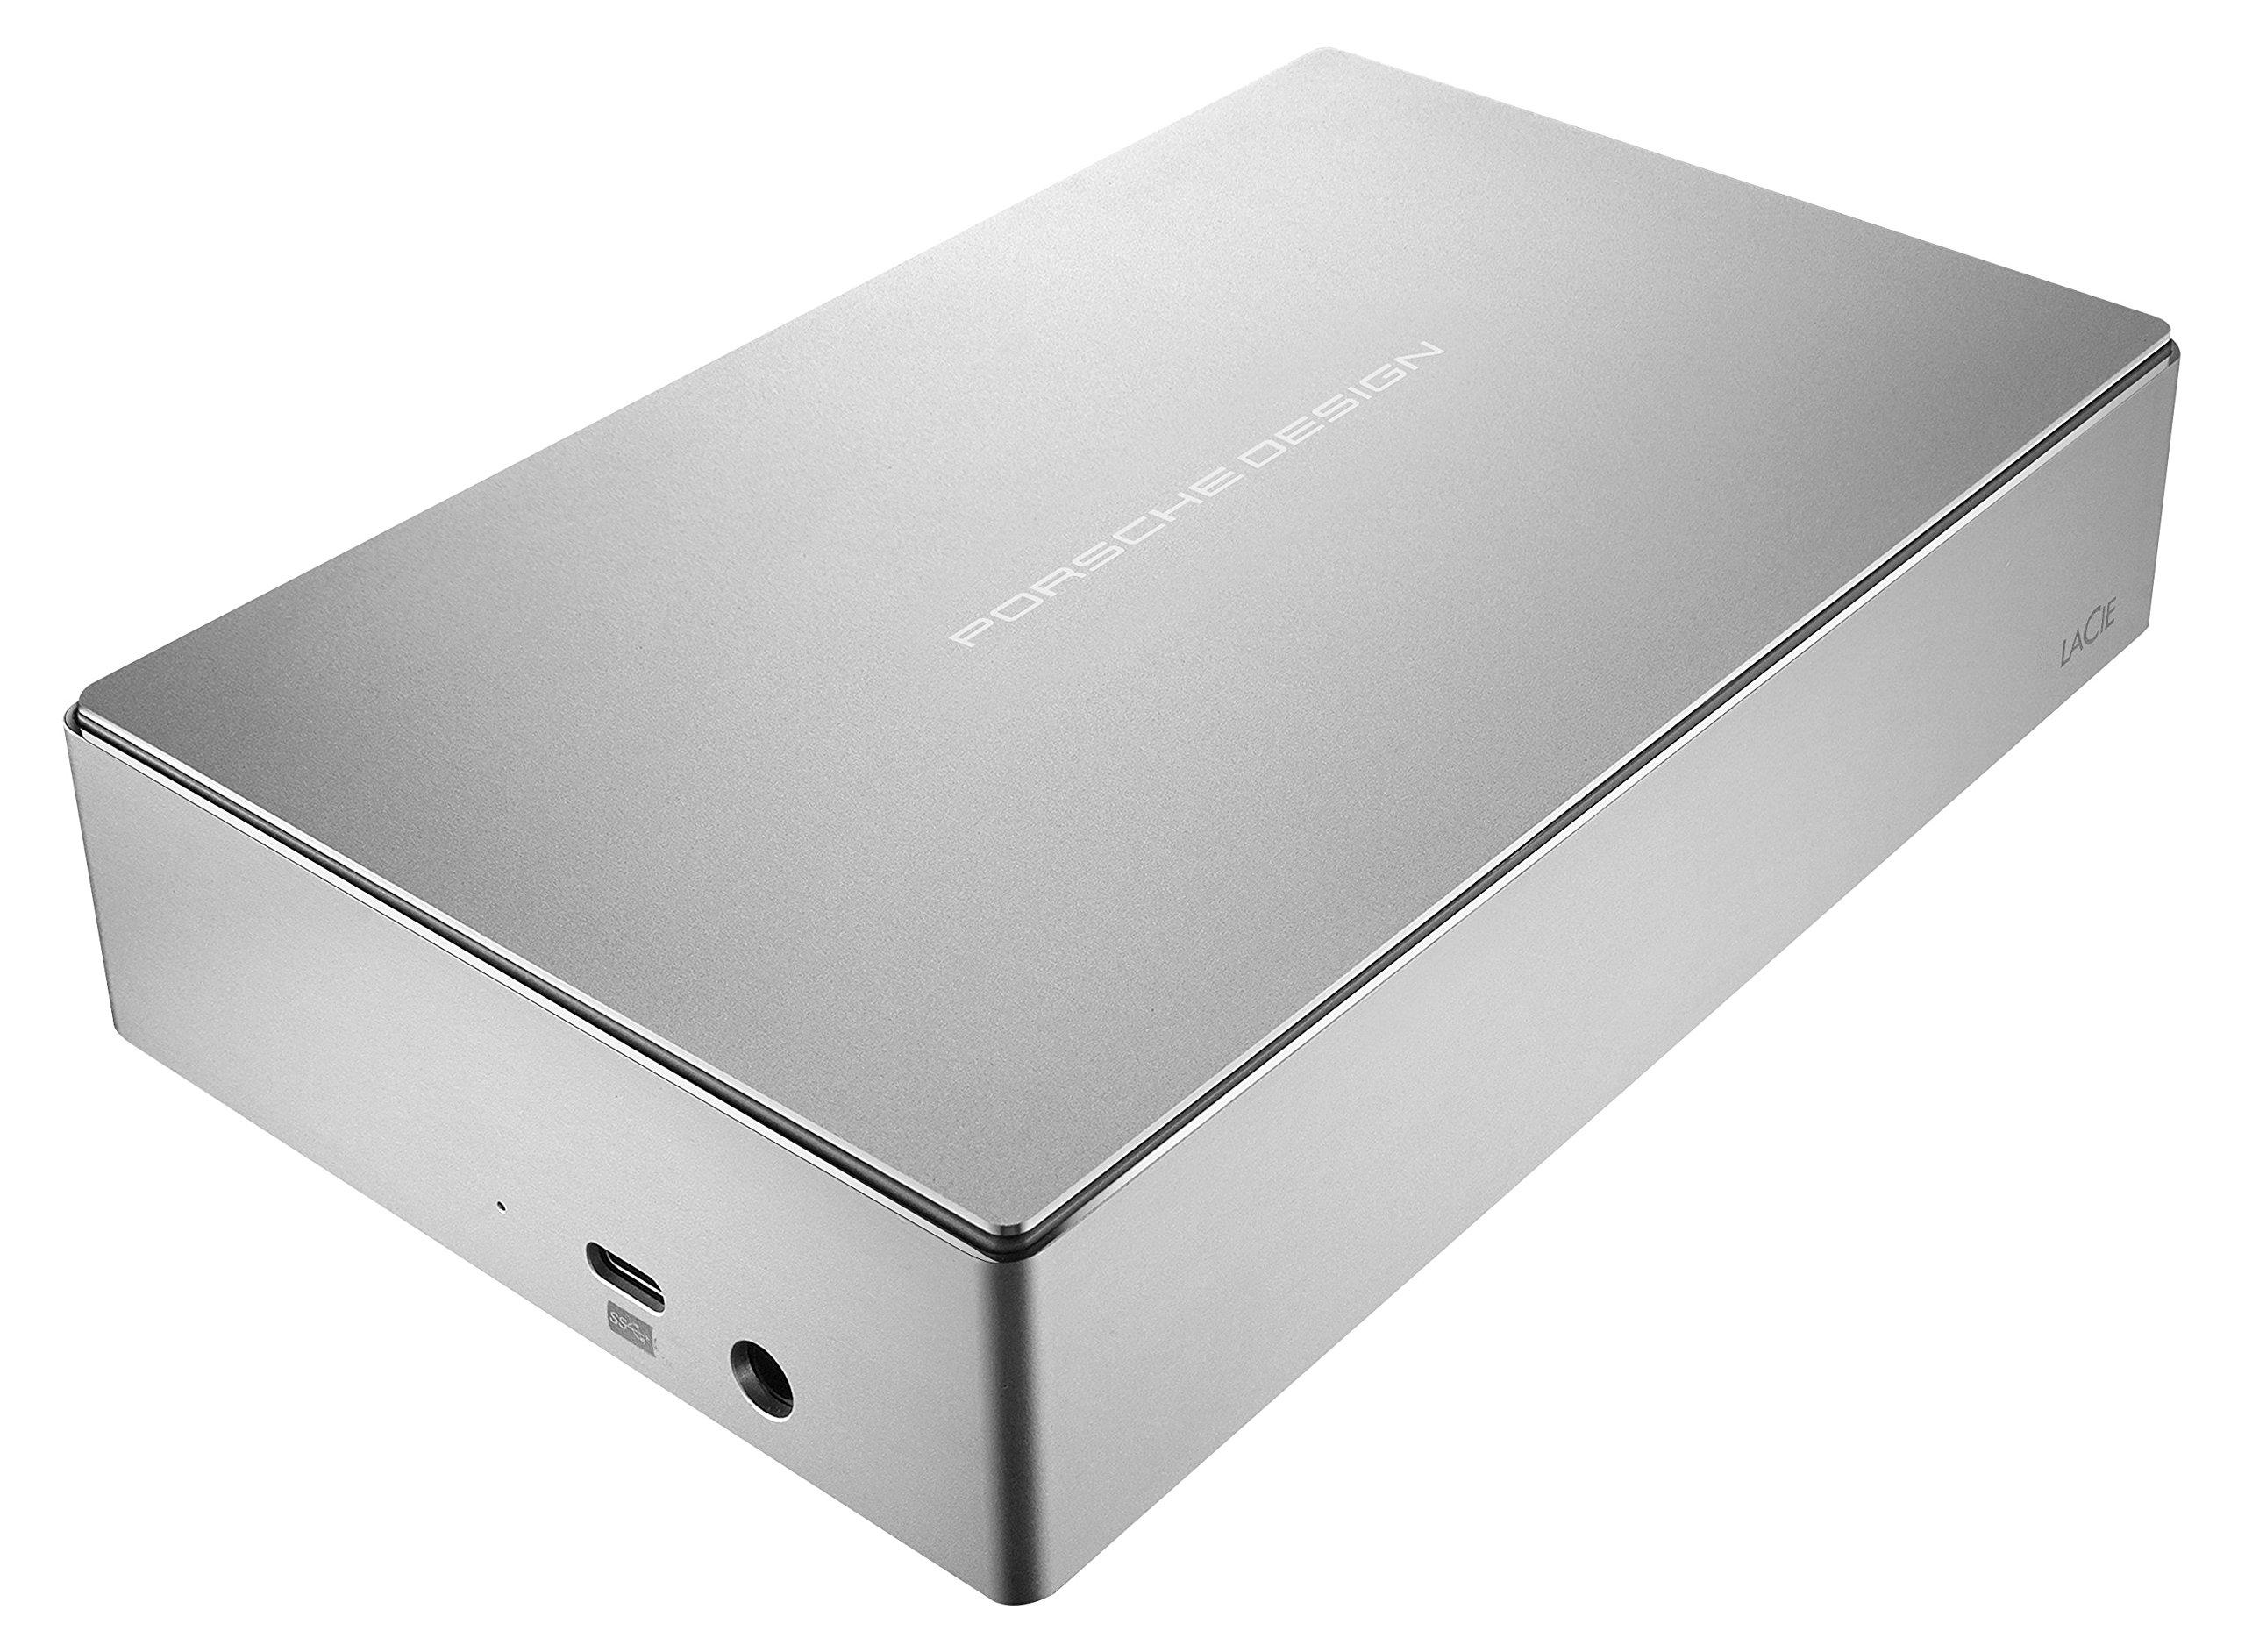 LaCie Porsche Design 8TB USB-C Desktop Hard Drive, Silver (STFE8000100) by LaCie